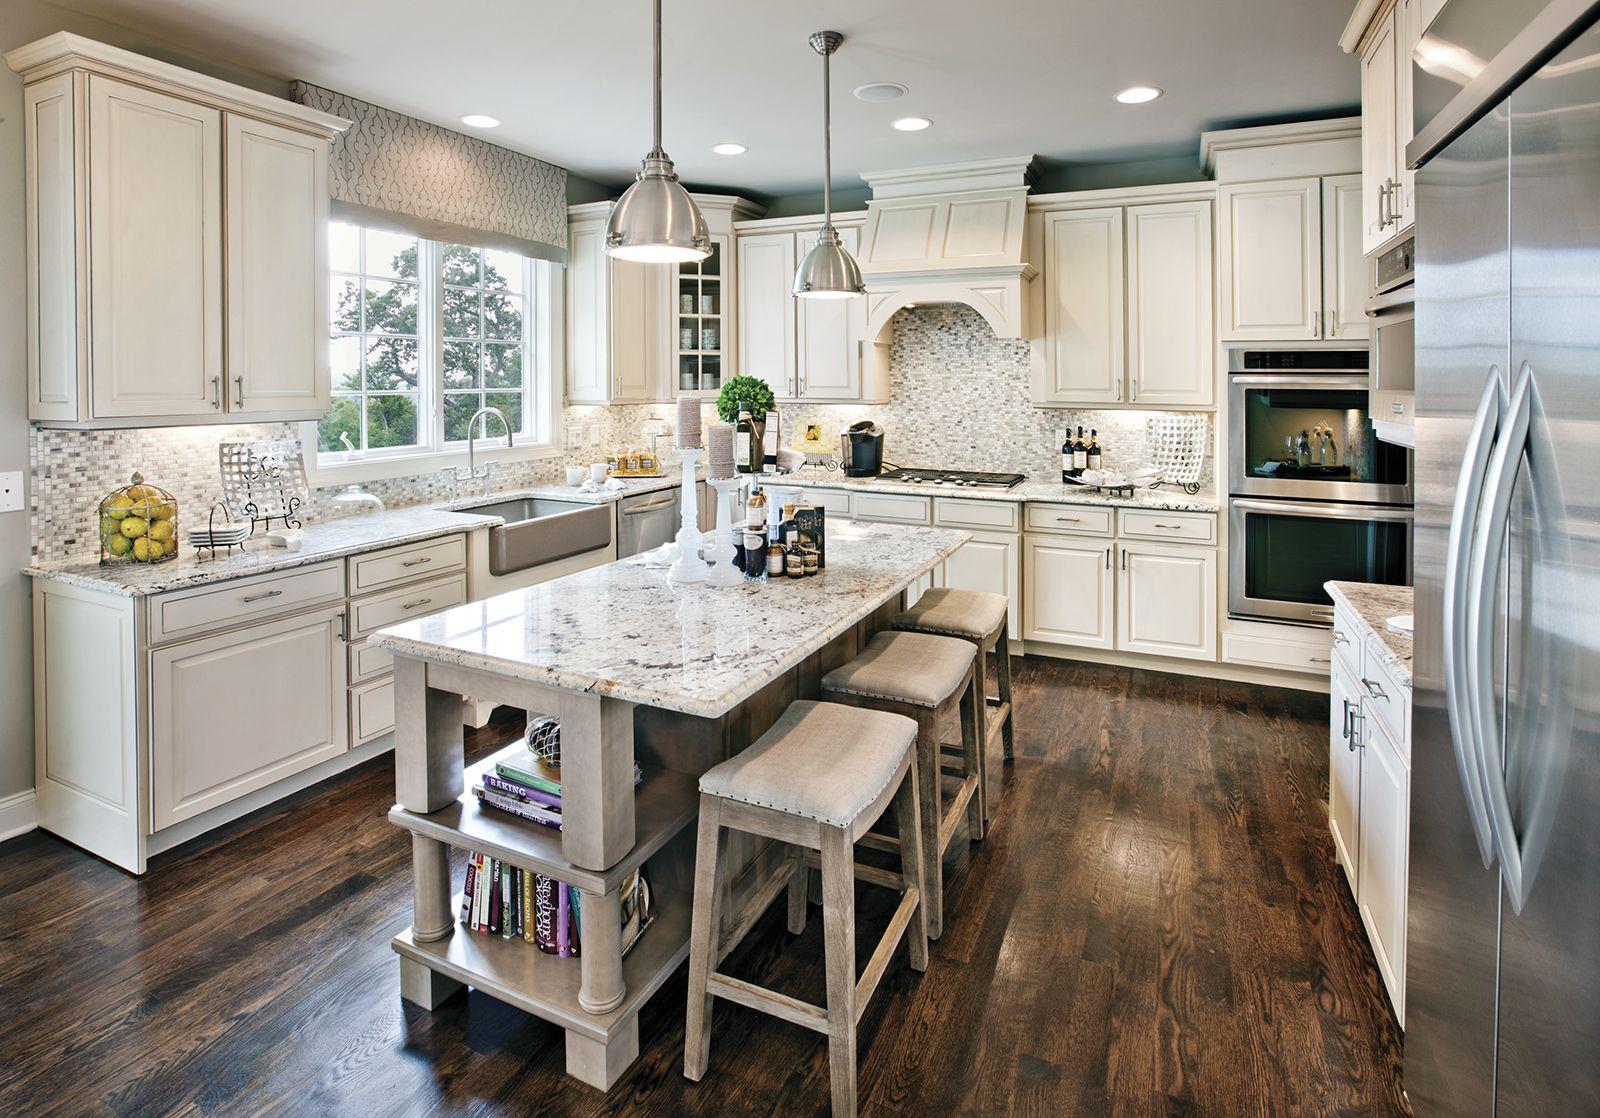 traditional white kitchen kitchen interiors interiordesign inspiring kitchens kitchen on outdoor kitchen vintage id=66374